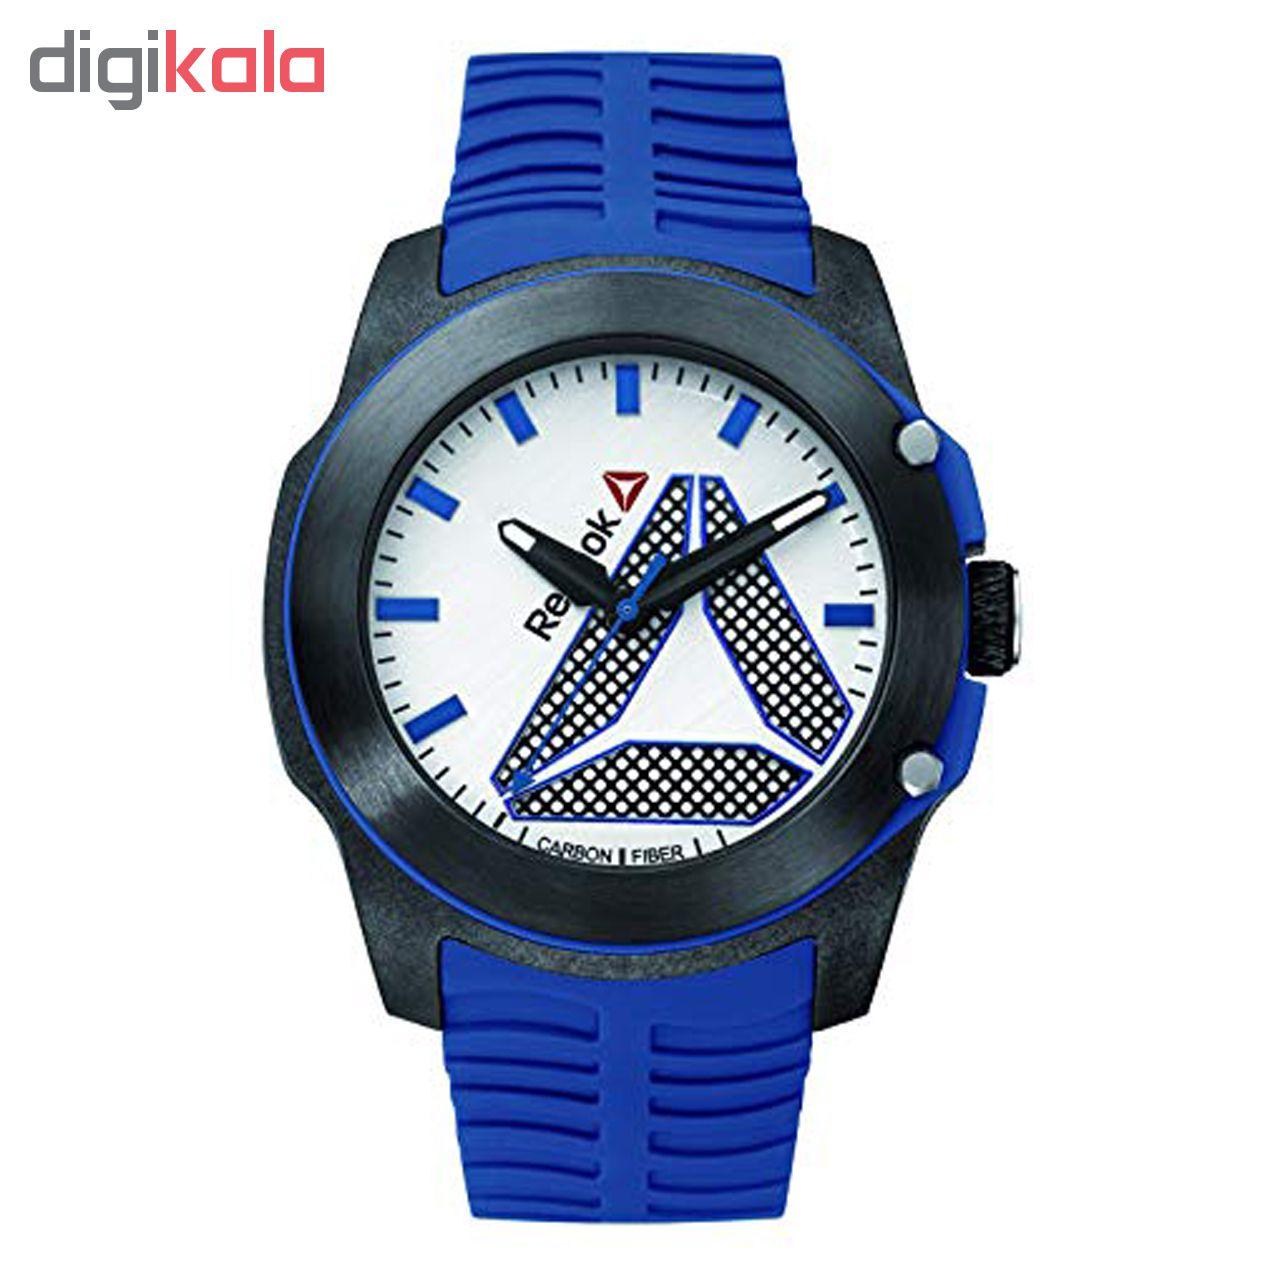 خرید ساعت مچی عقربه ای مردانه ریباک مدل RD-TFL-G2-CBIN-1N